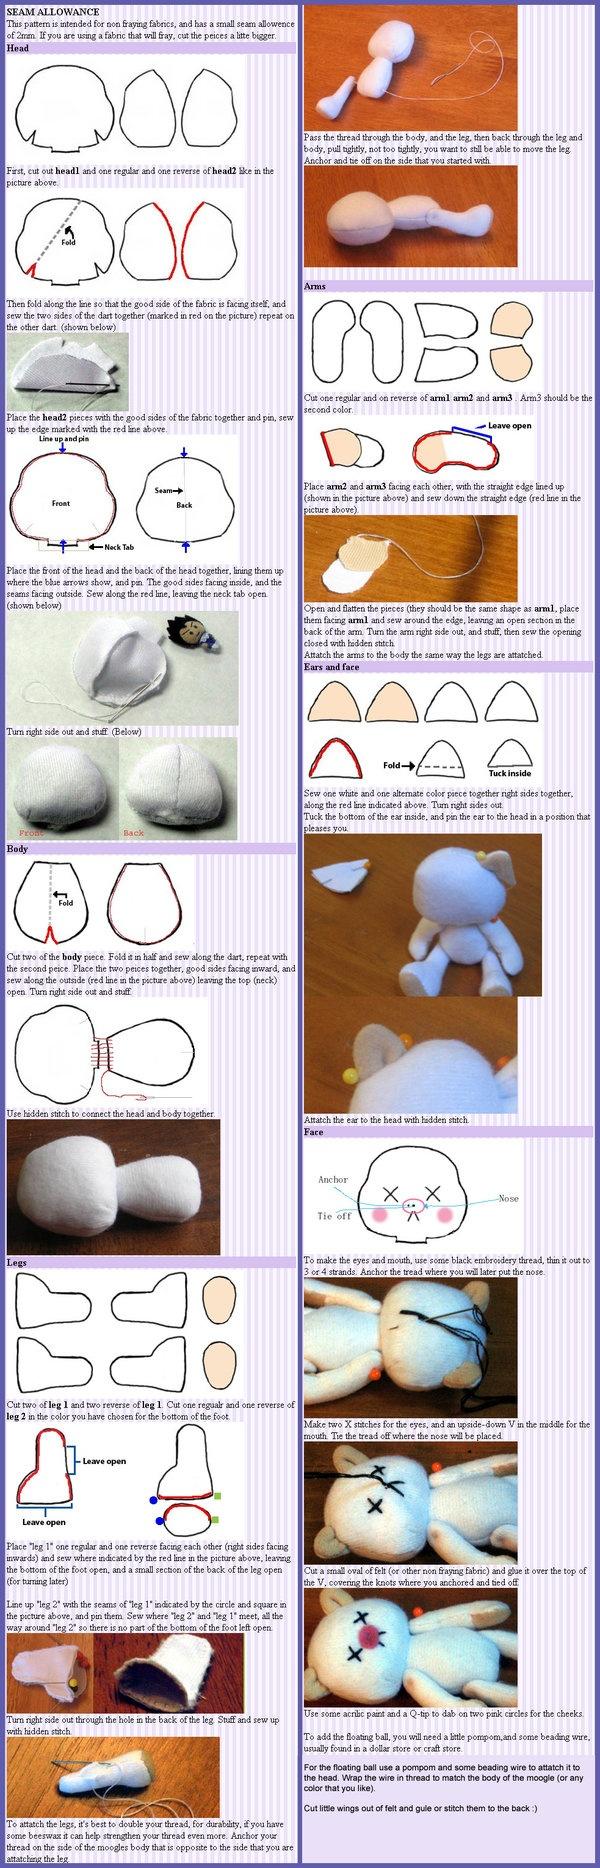 Moogle plush pattern.  I love BabyLondonStar's plushes